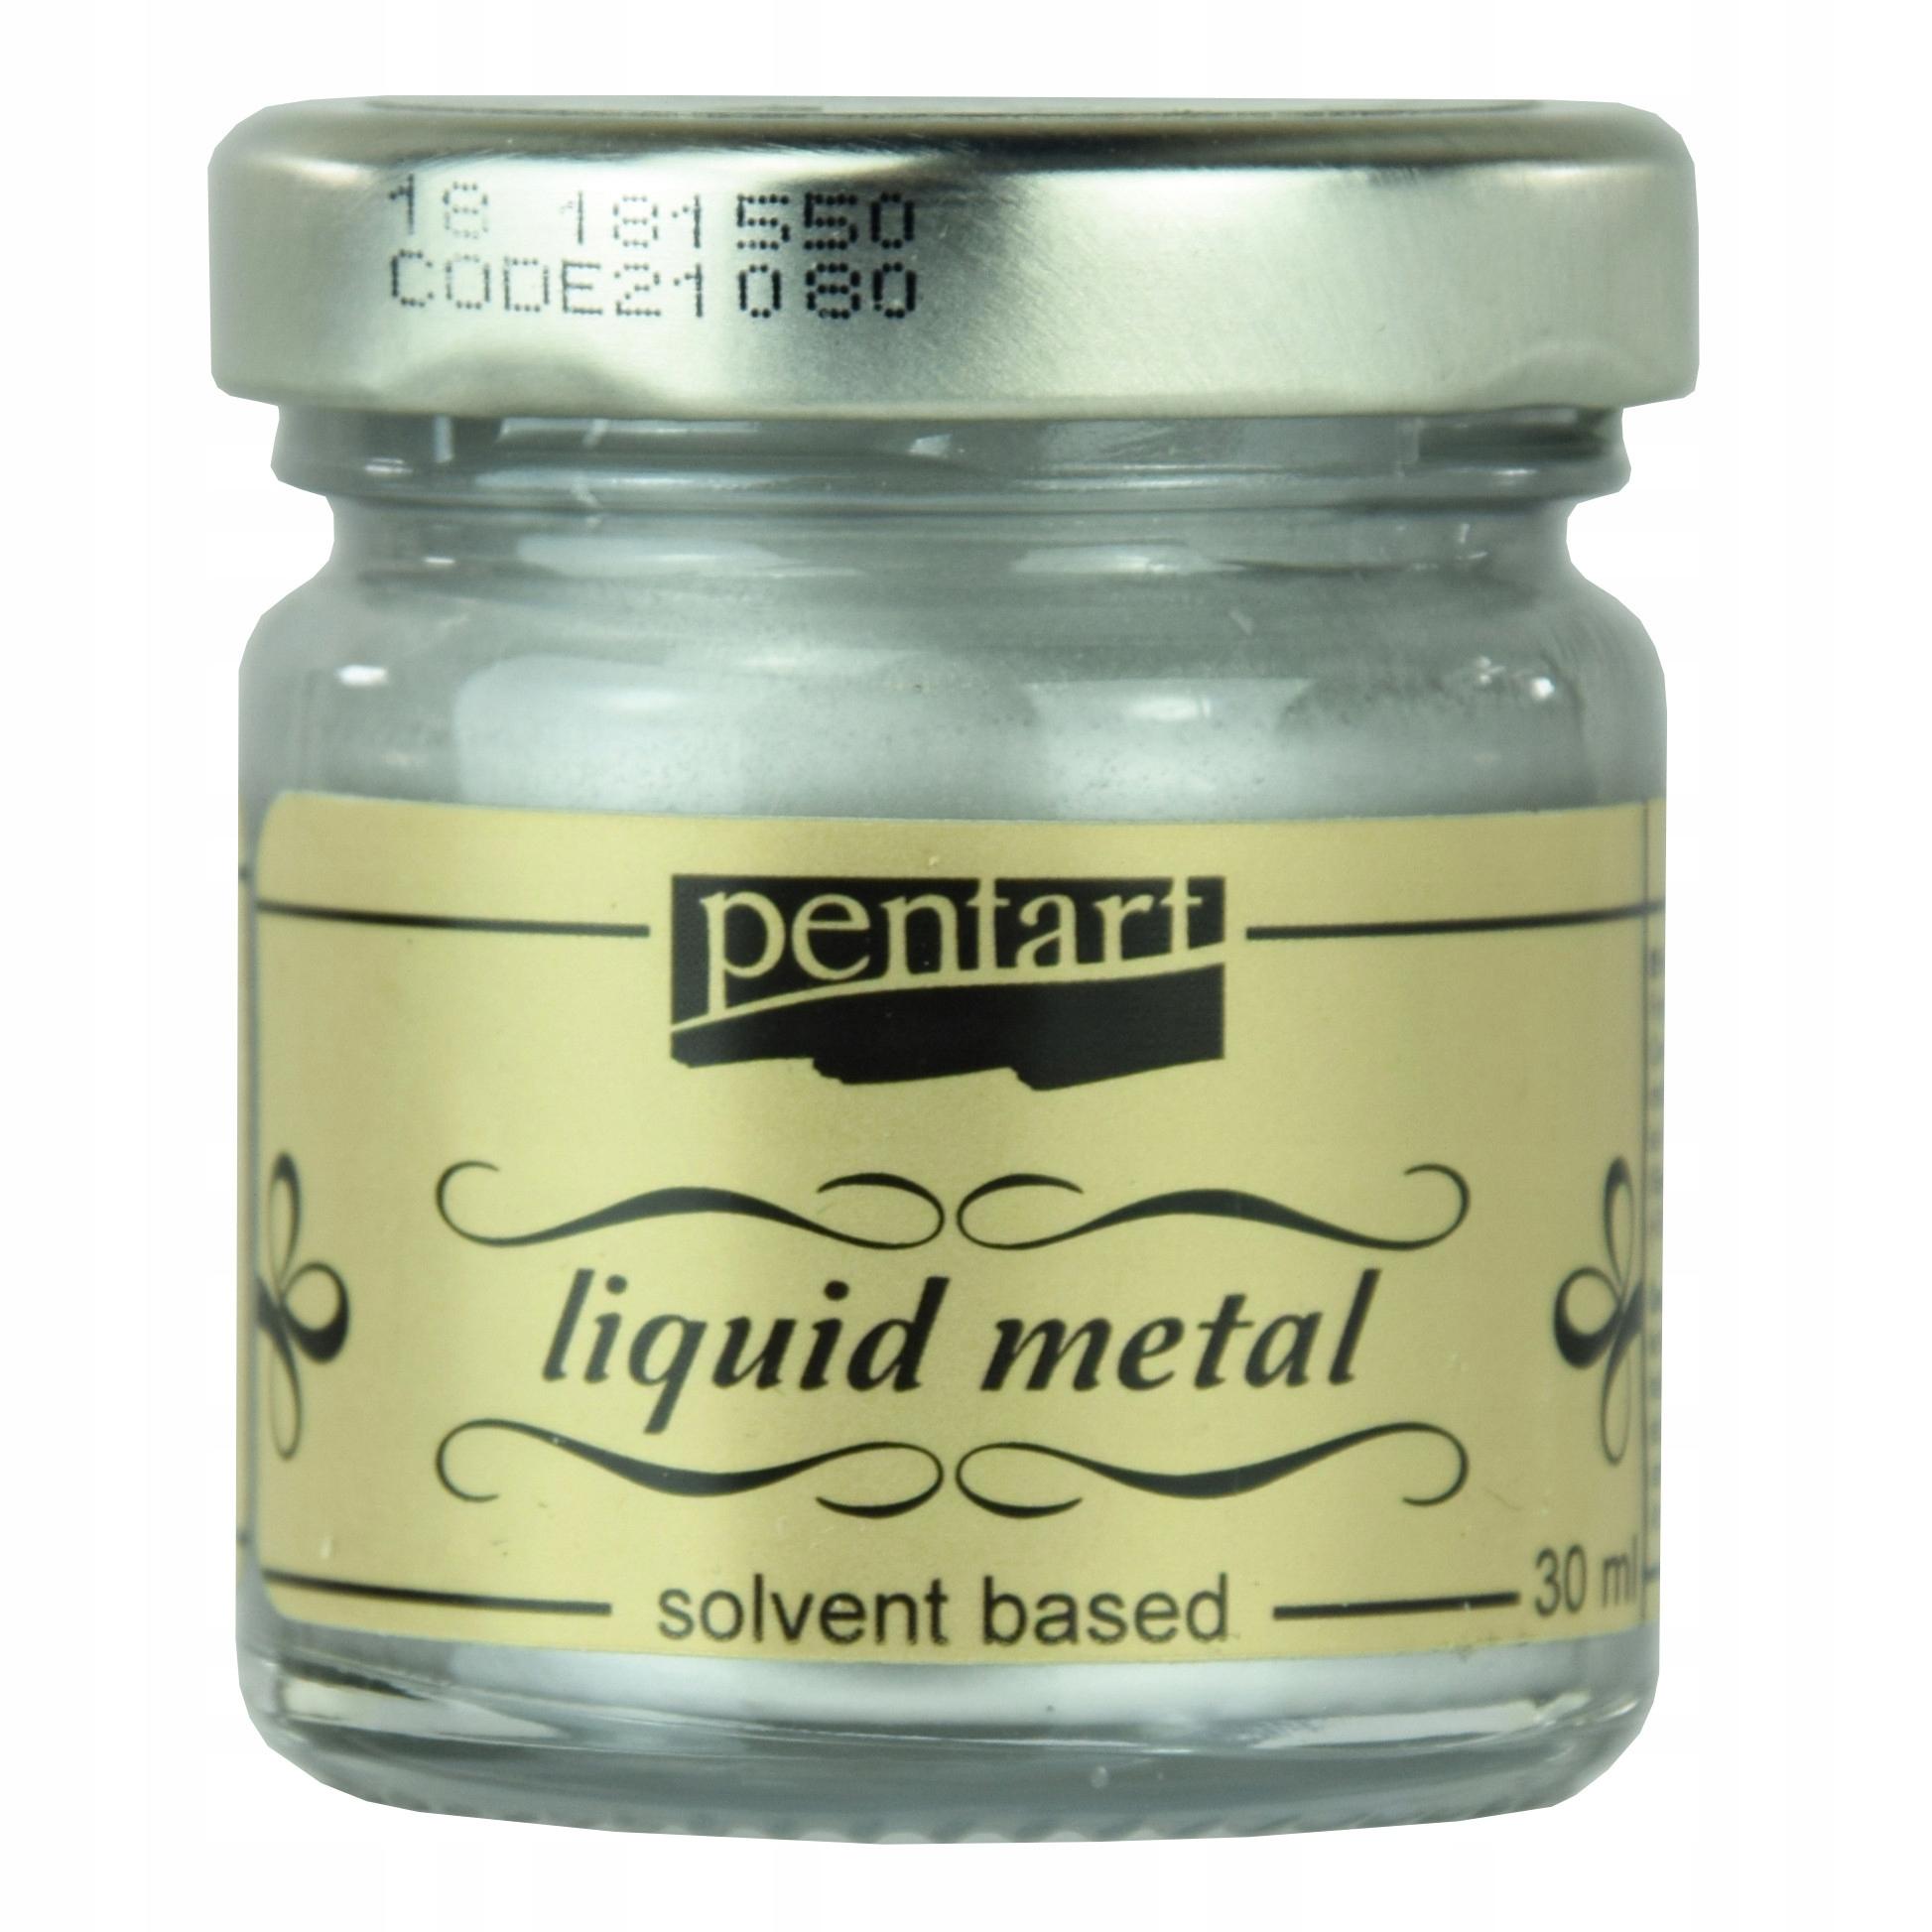 Жидкий Металл краска - Pentart - серебро , 30 мл